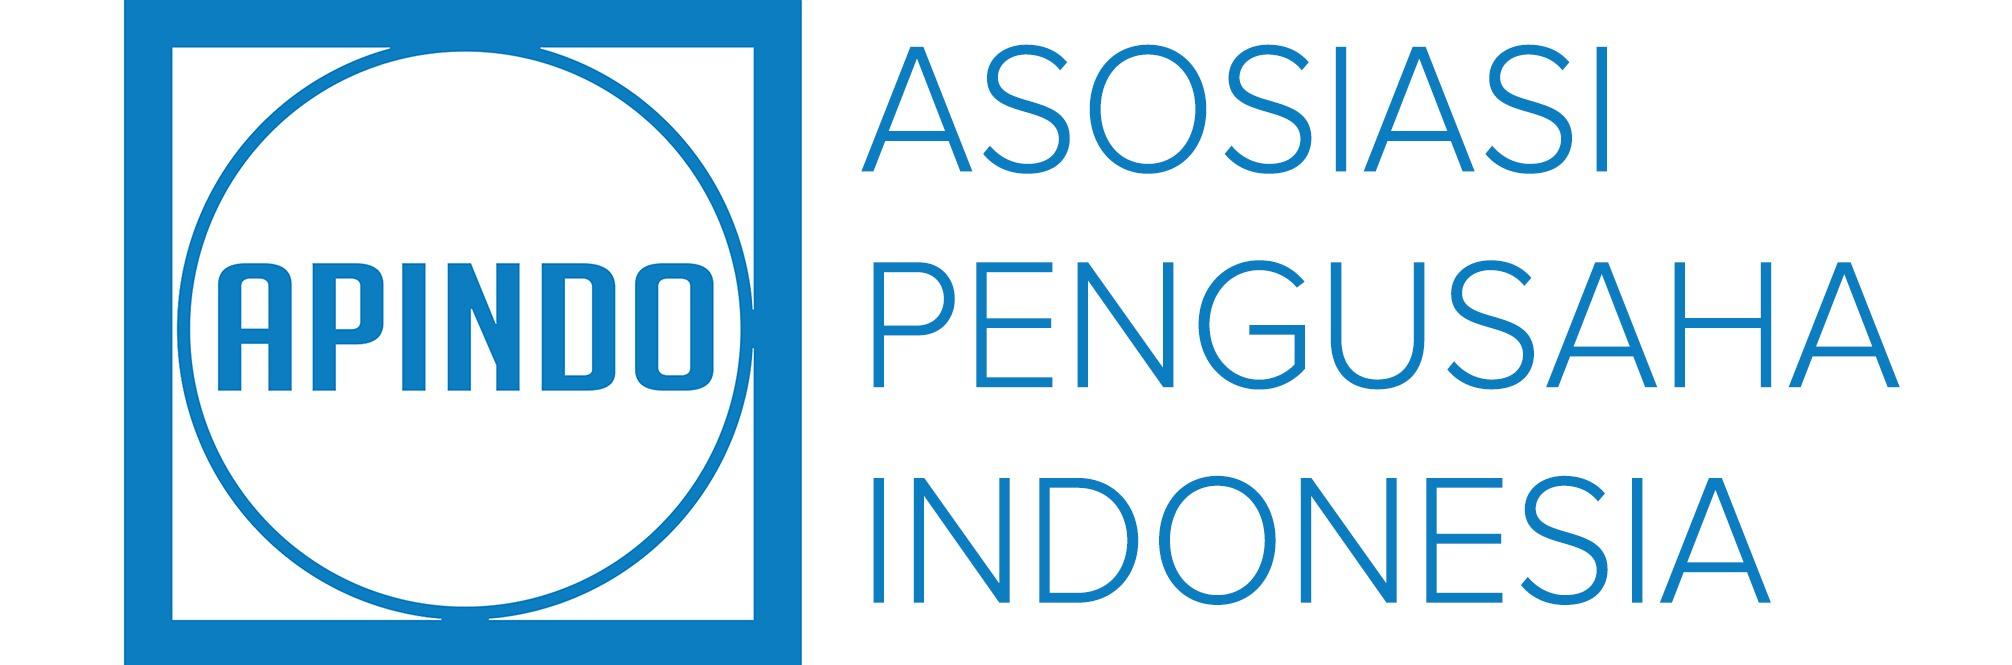 APINDO logo